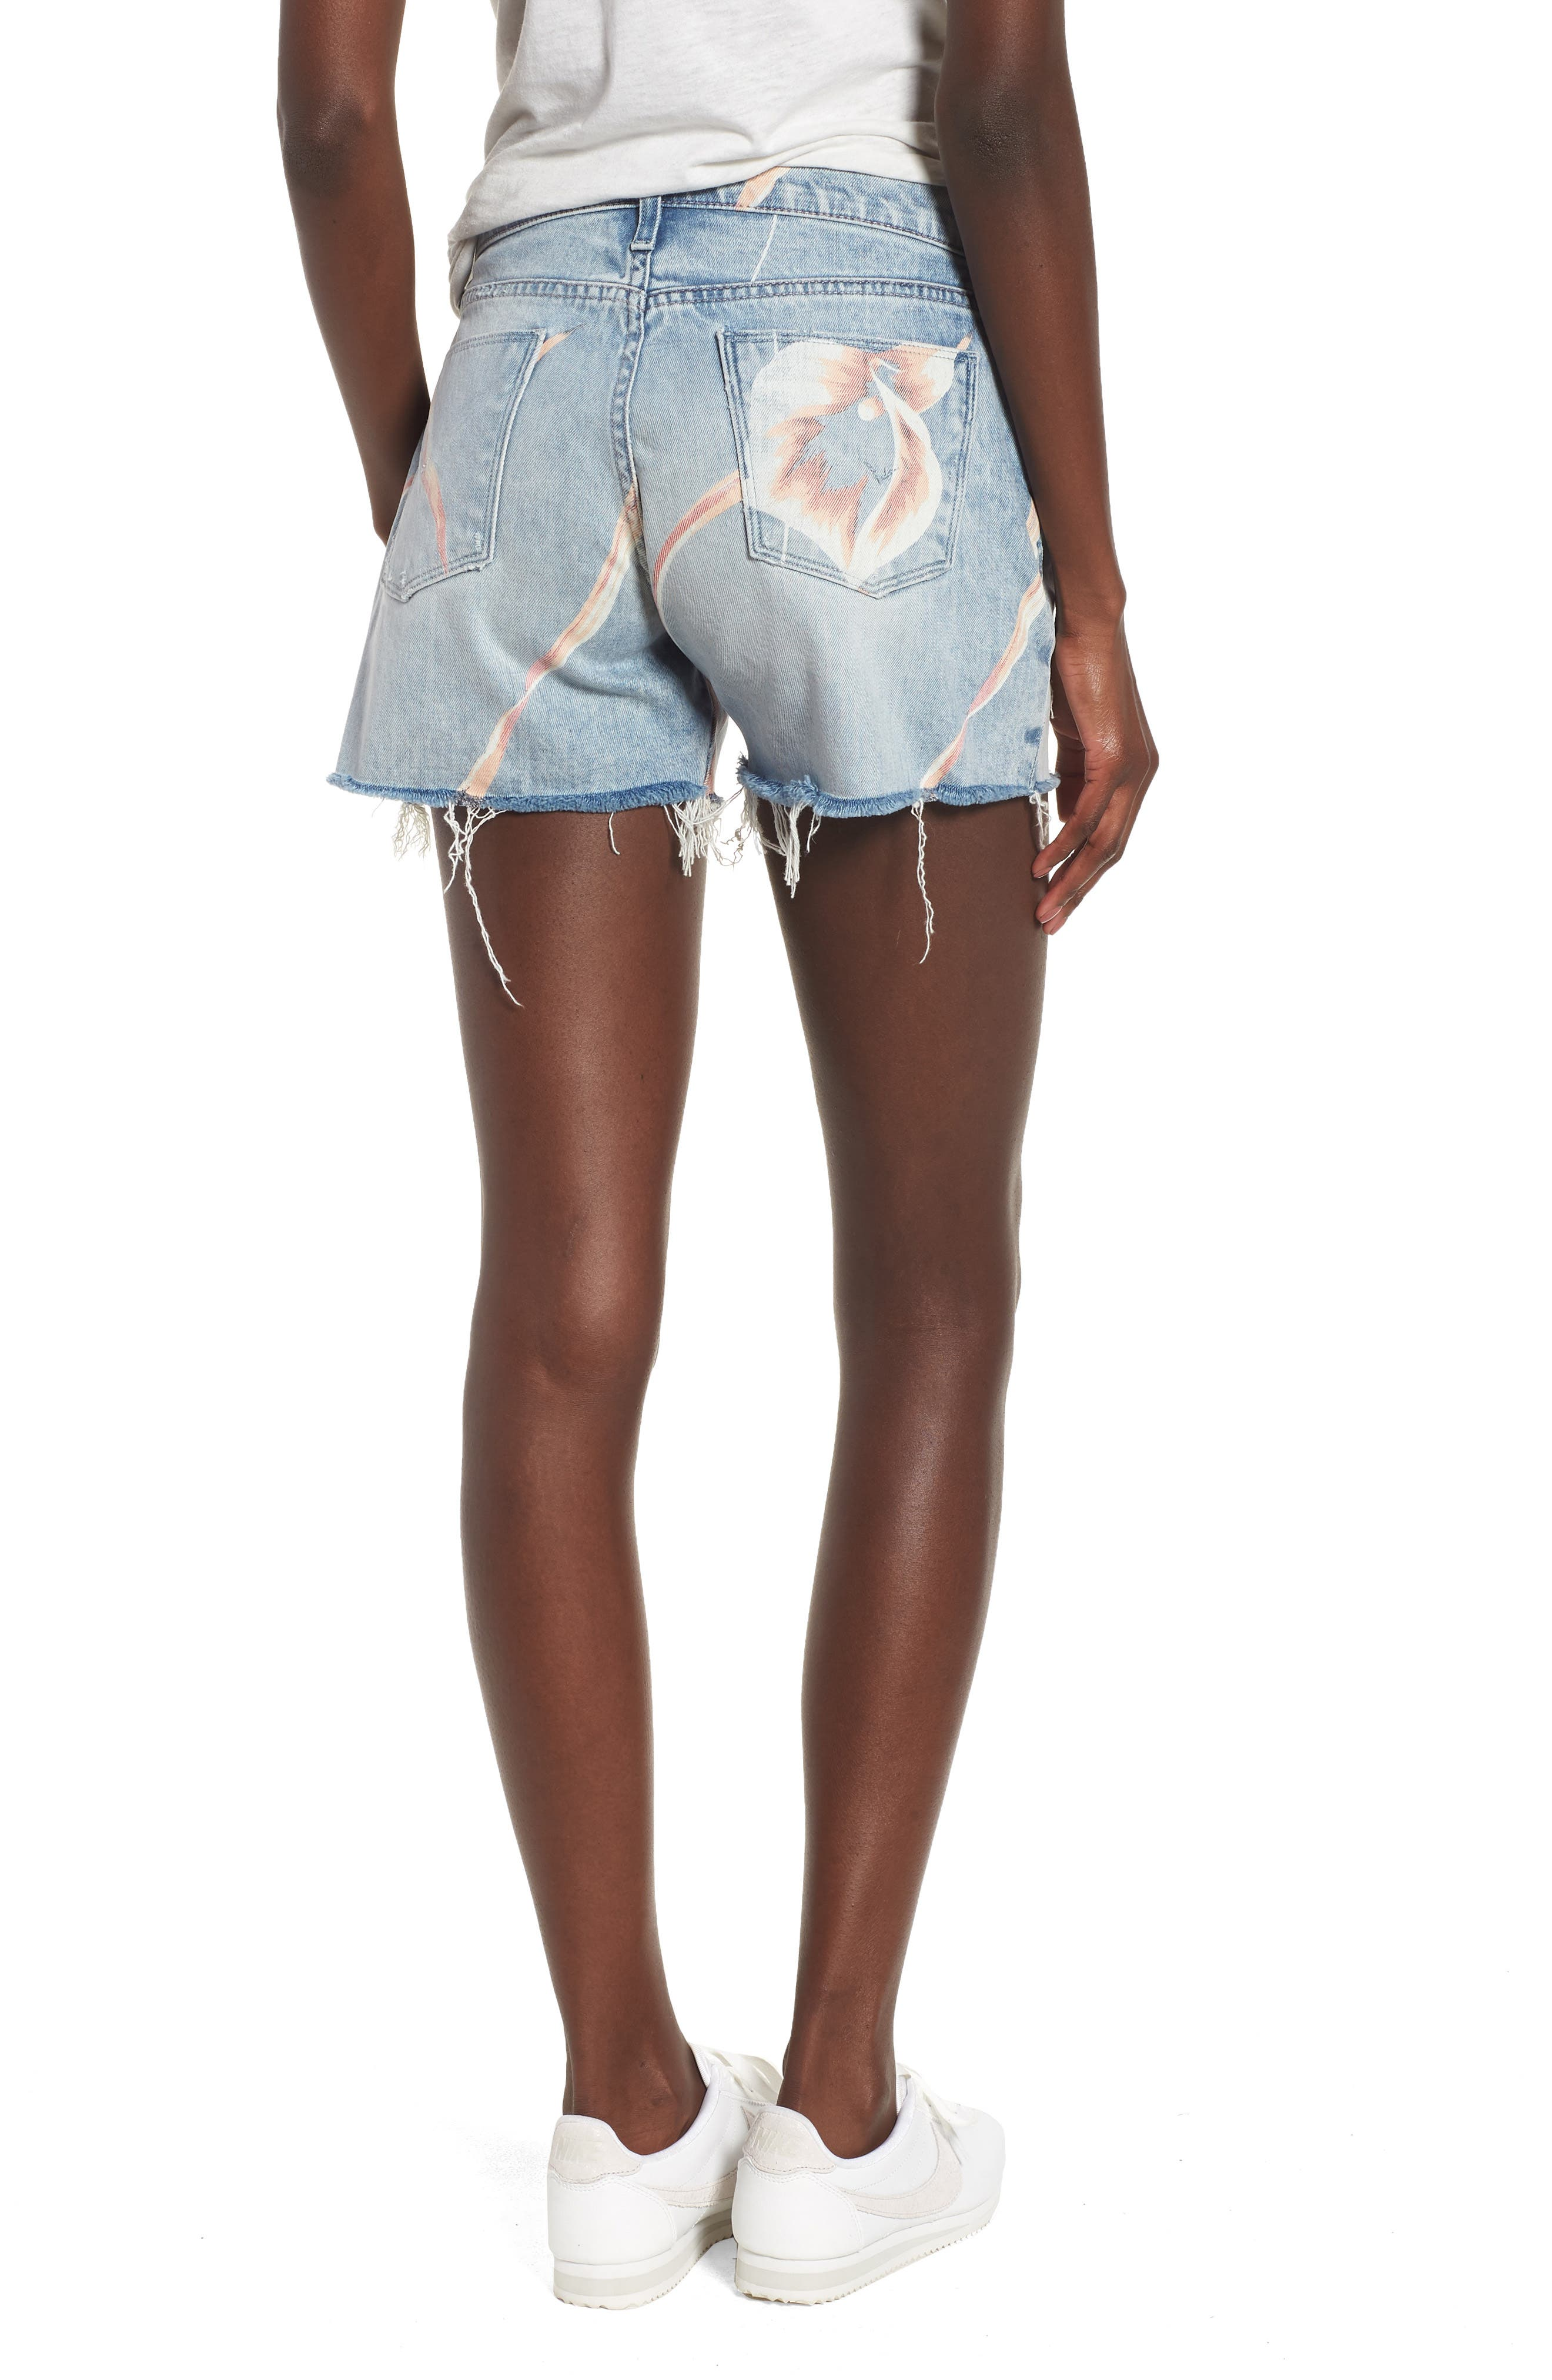 Valeri Painted Denim Shorts,                             Alternate thumbnail 2, color,                             In Bloom